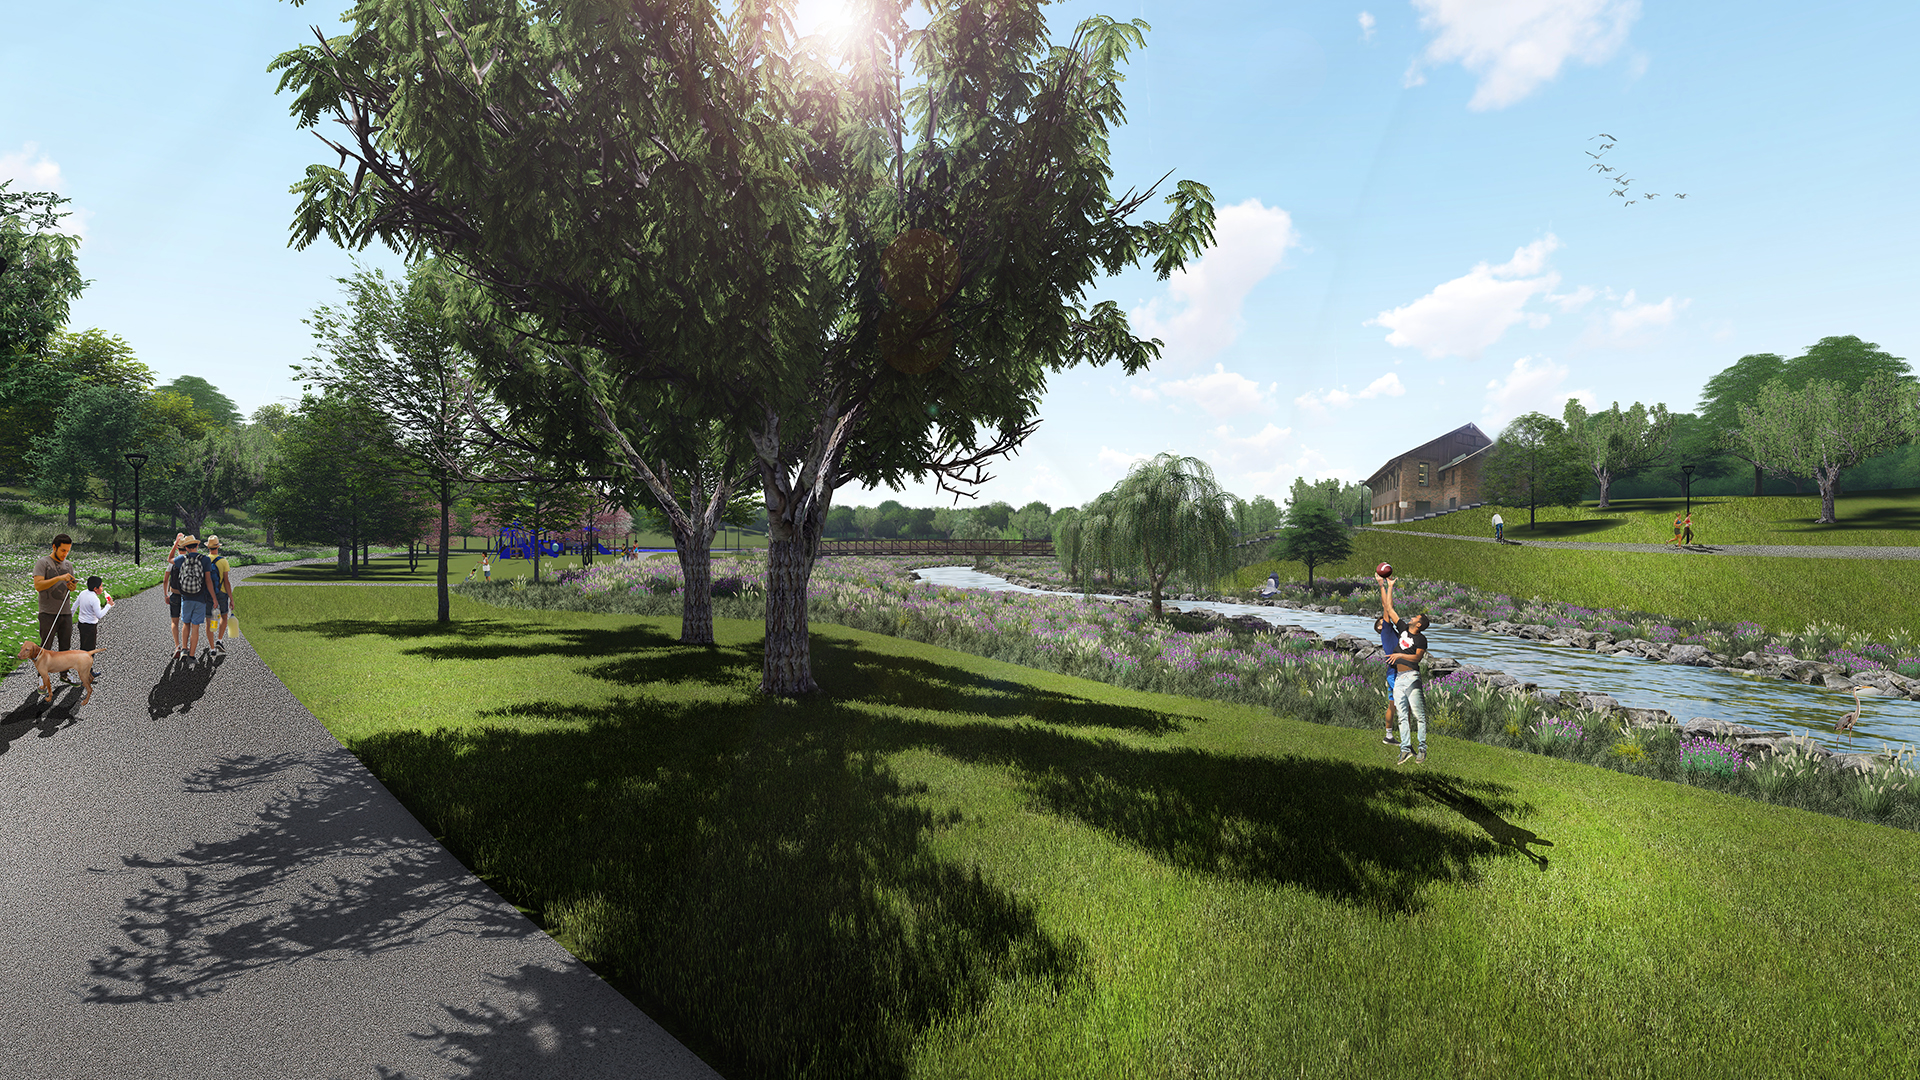 Tomrrow: Looking east in Pulaski Park (future vision)